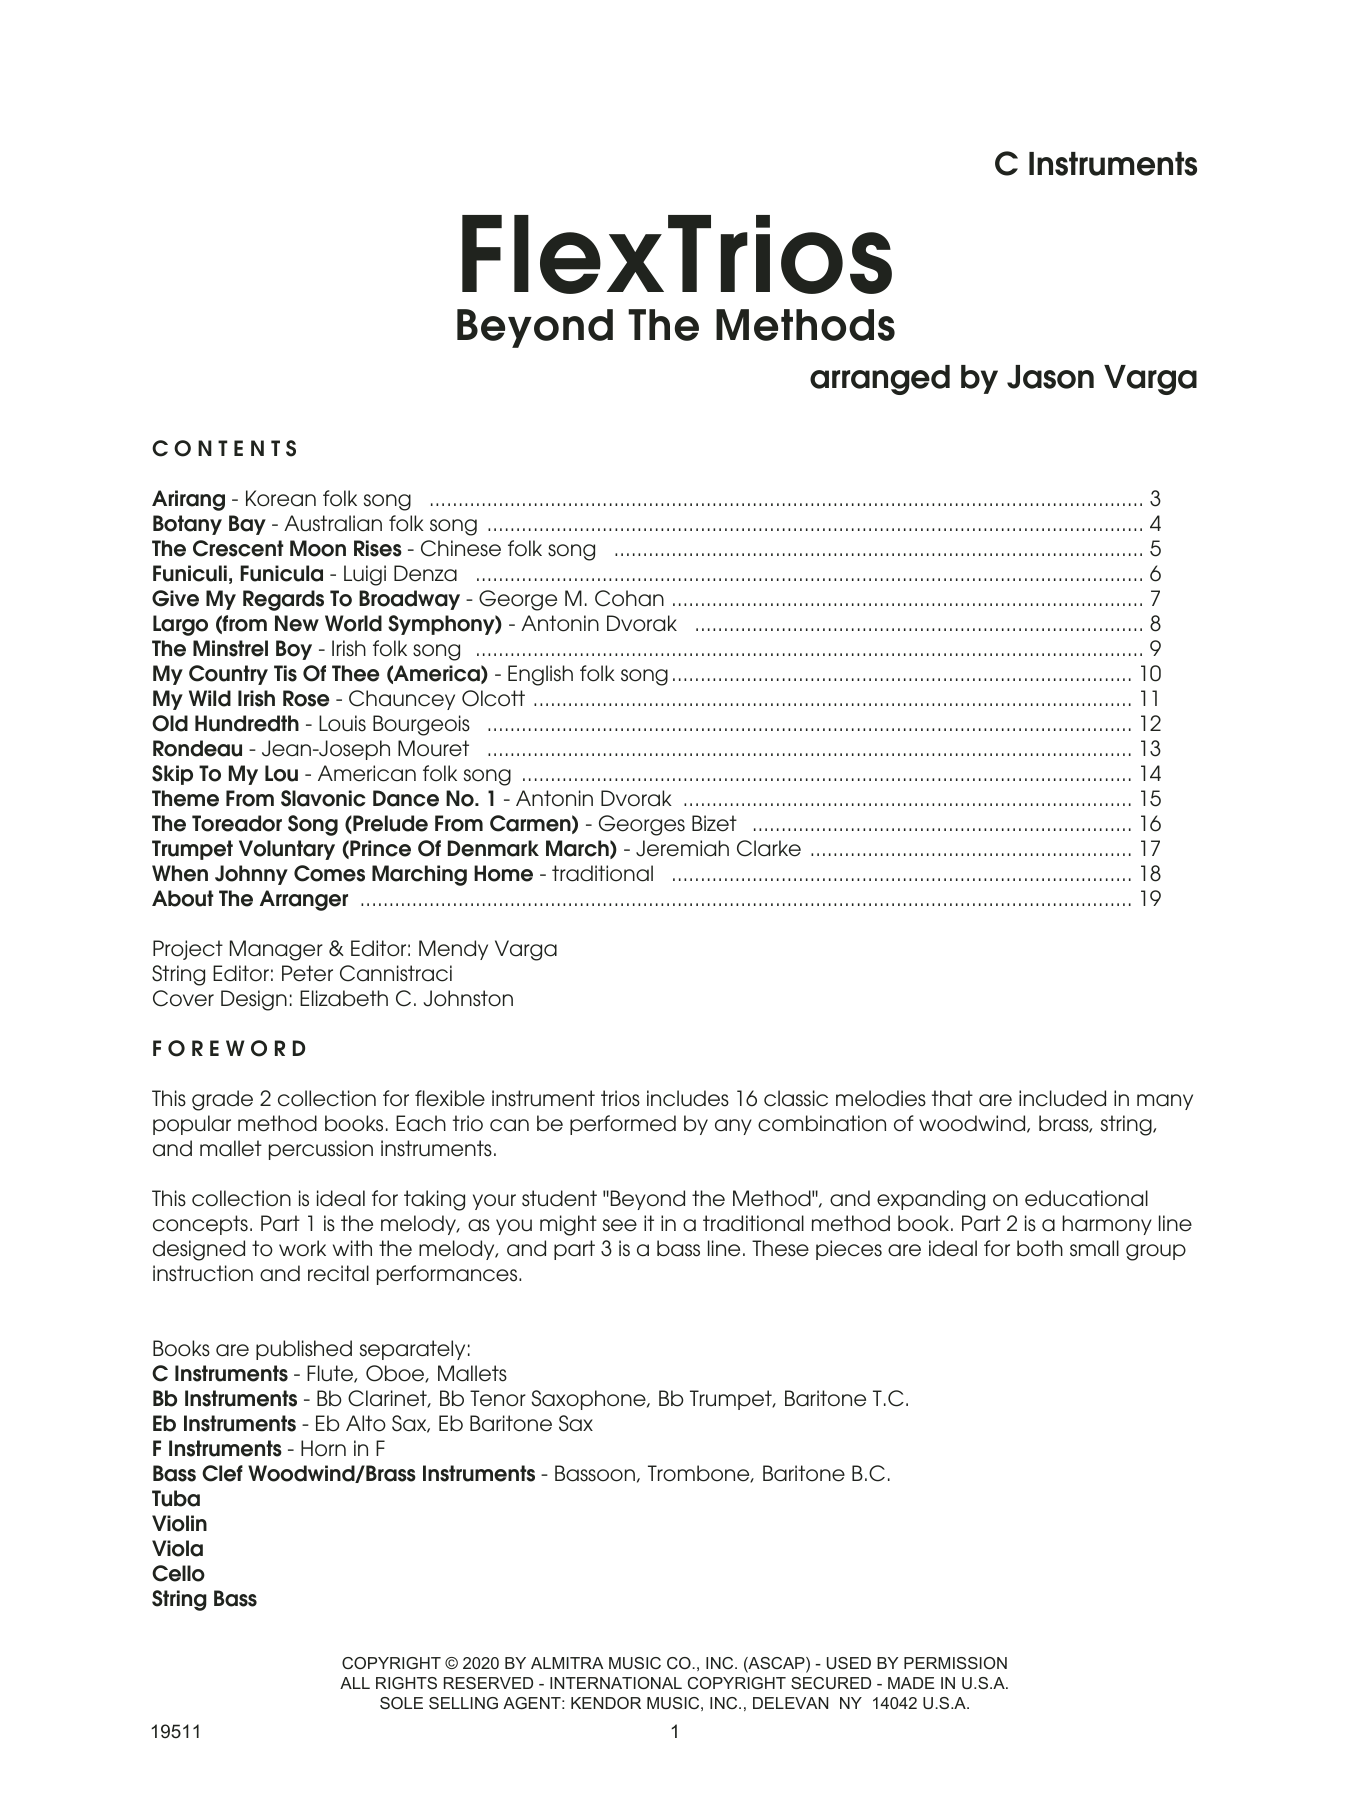 Flextrios - Beyond The Methods (16 Pieces) - C Instruments Sheet Music